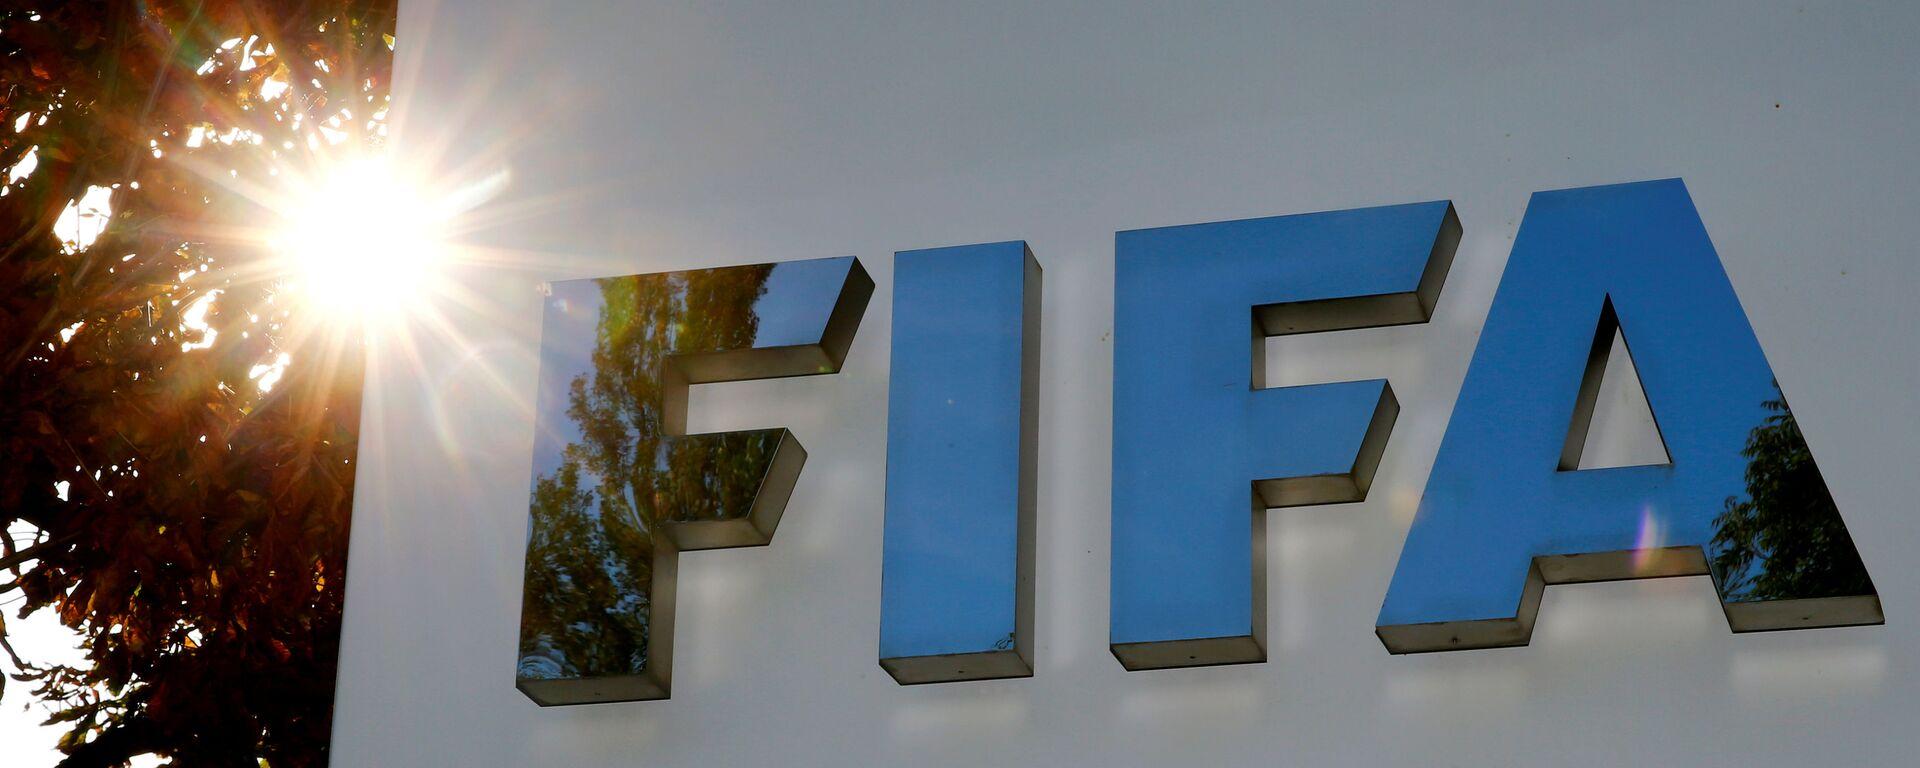 Штаб-квартира ФИФА в швейцарском Цюрихе - Sputnik Беларусь, 1920, 25.08.2021